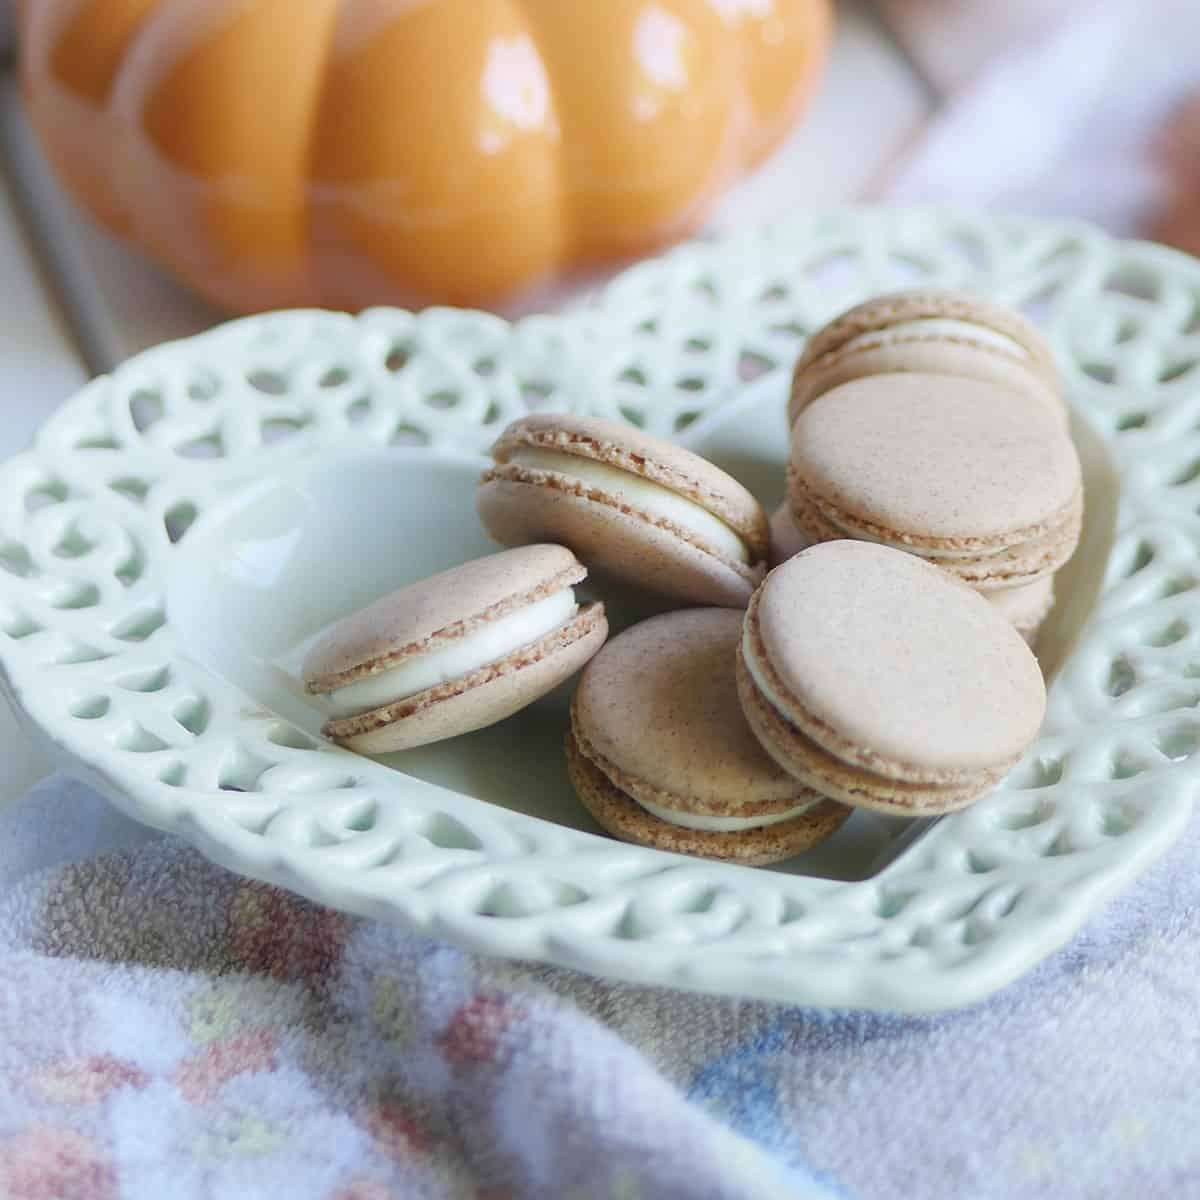 Pumpkin spice macarons on a heart shaped plate with pumpkin